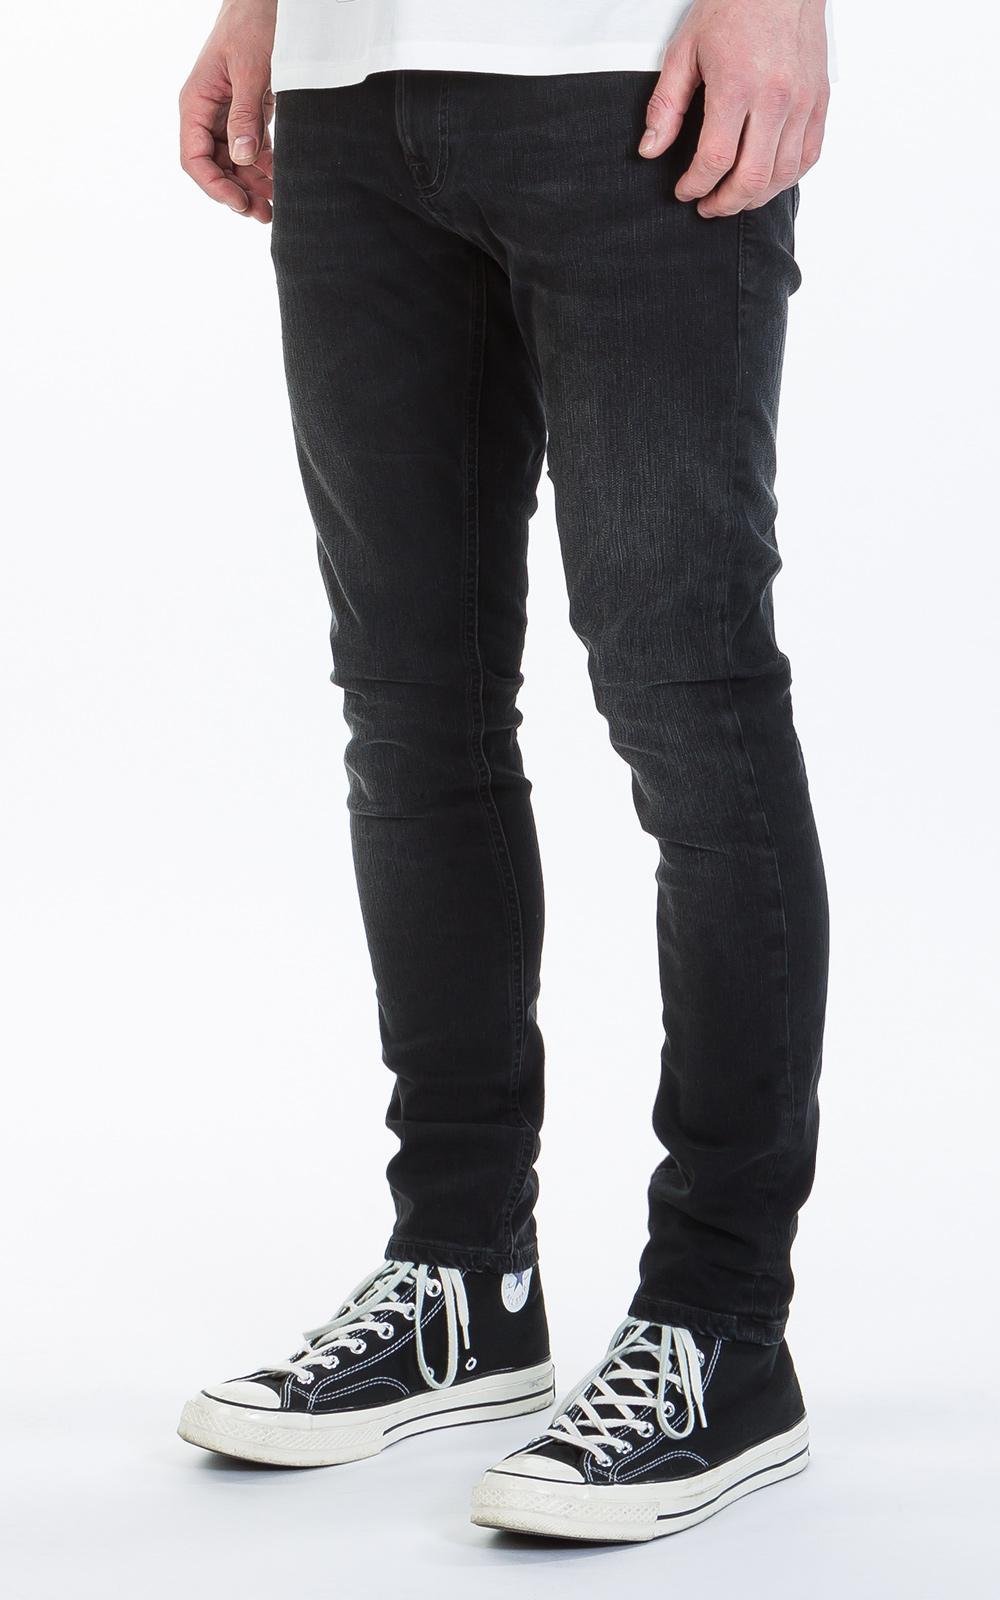 d7d33268e05ee Lyst - Nudie Jeans Nudie Jeans Tight Terry Black Breath in Black for Men